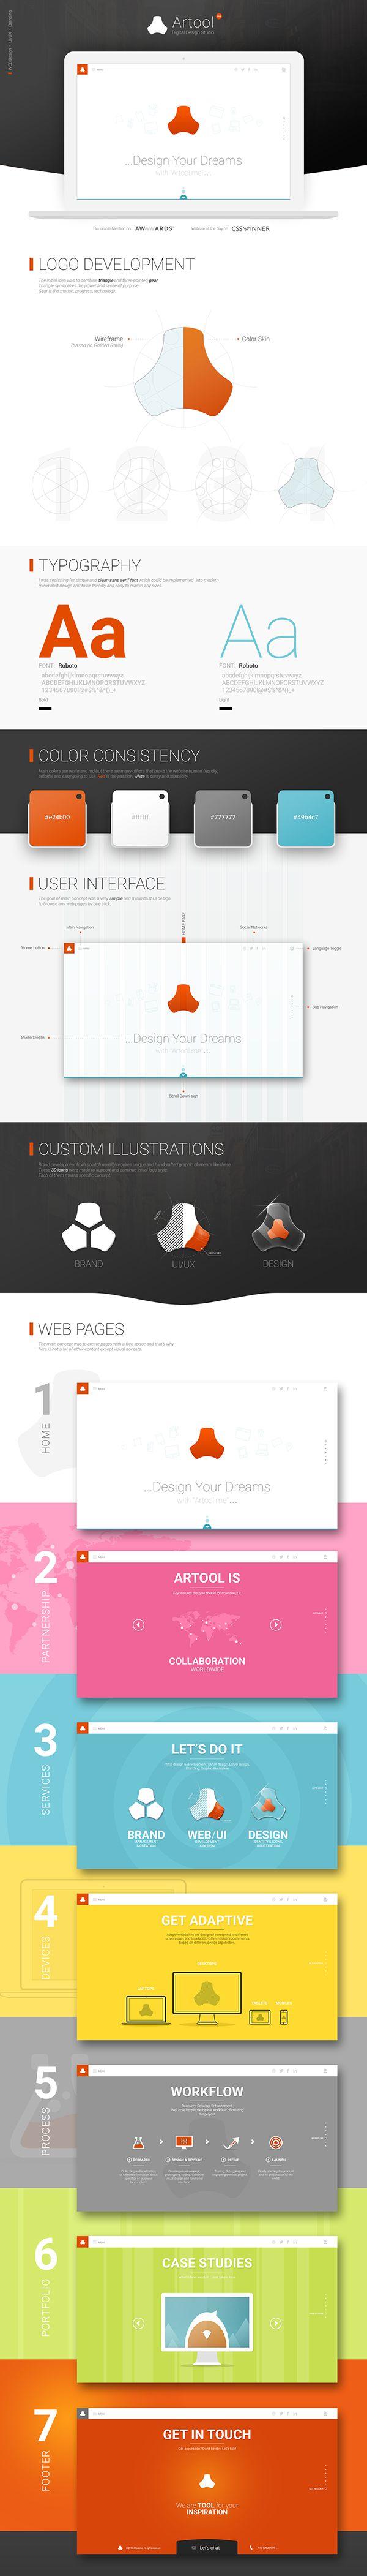 Artool Me website design #webdesign #trend #logodesign #wireframe #workflow #behance #portfolio #red #black